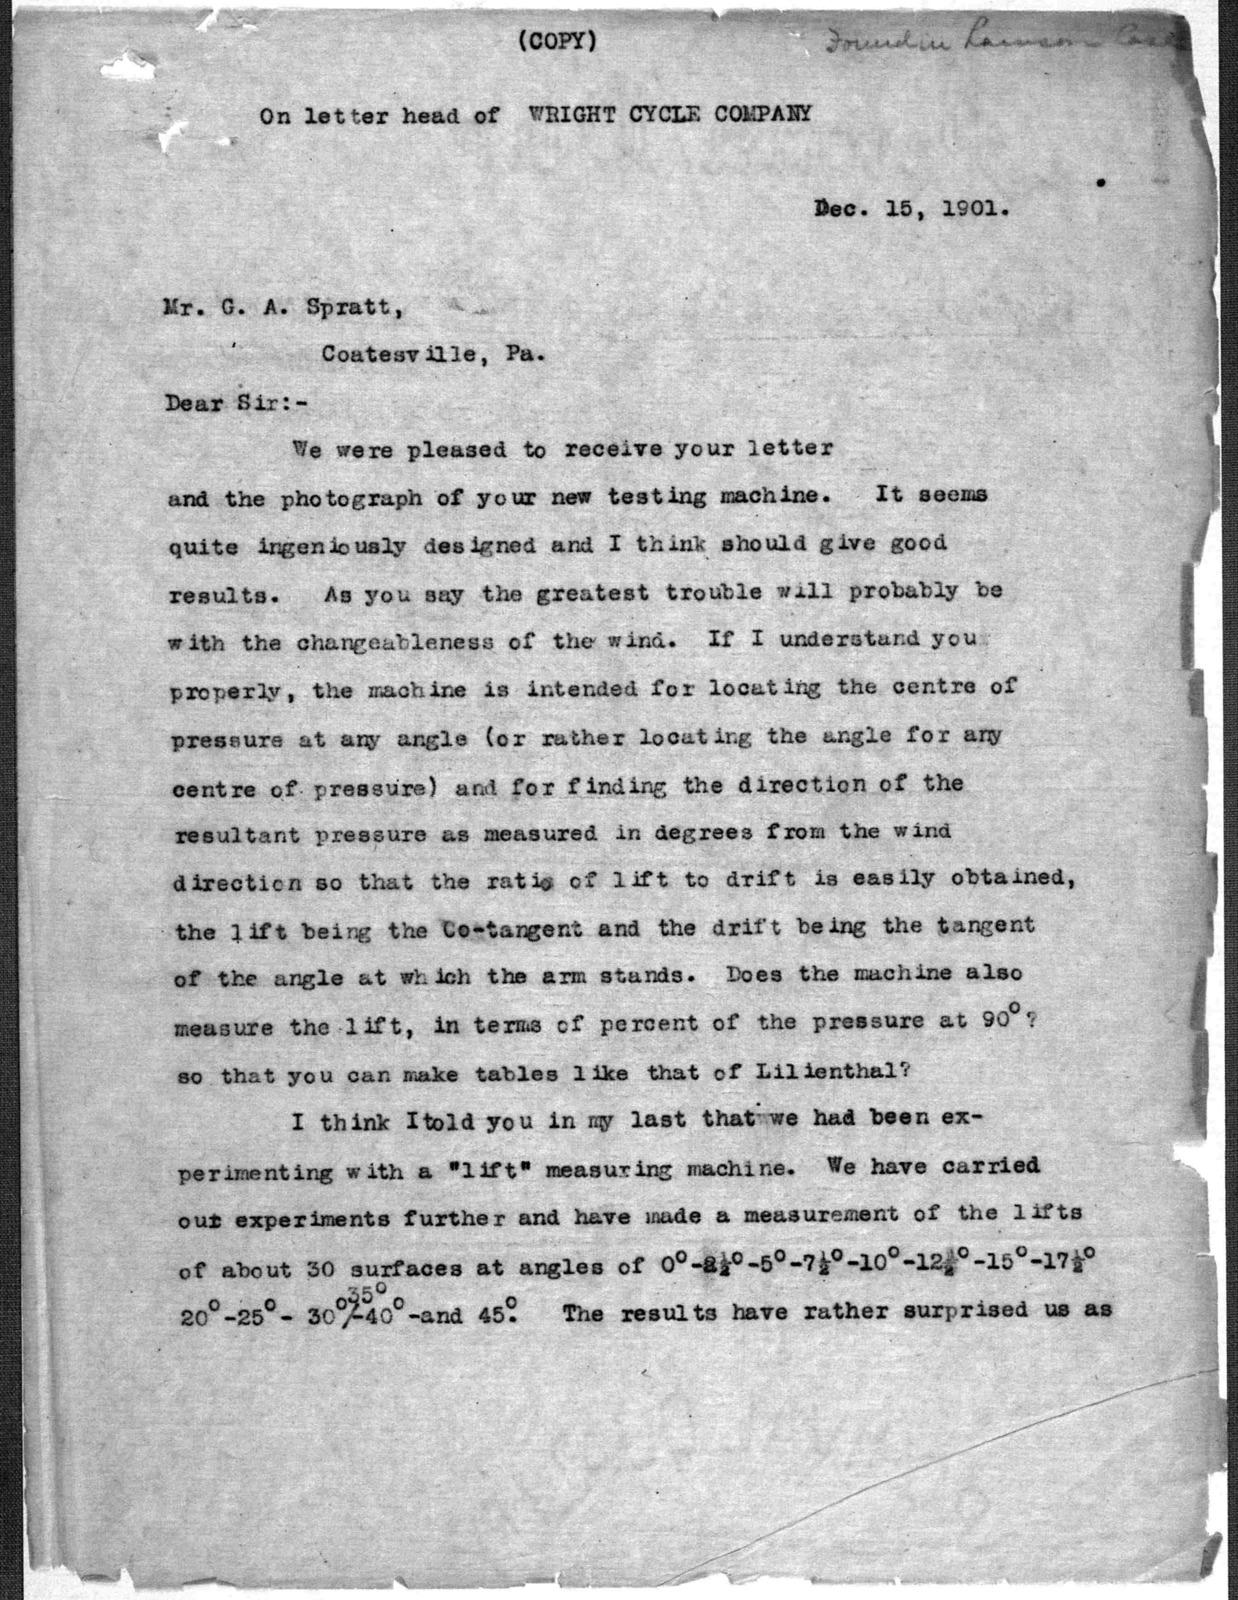 General Correspondence:  Spratt, George A., 1901